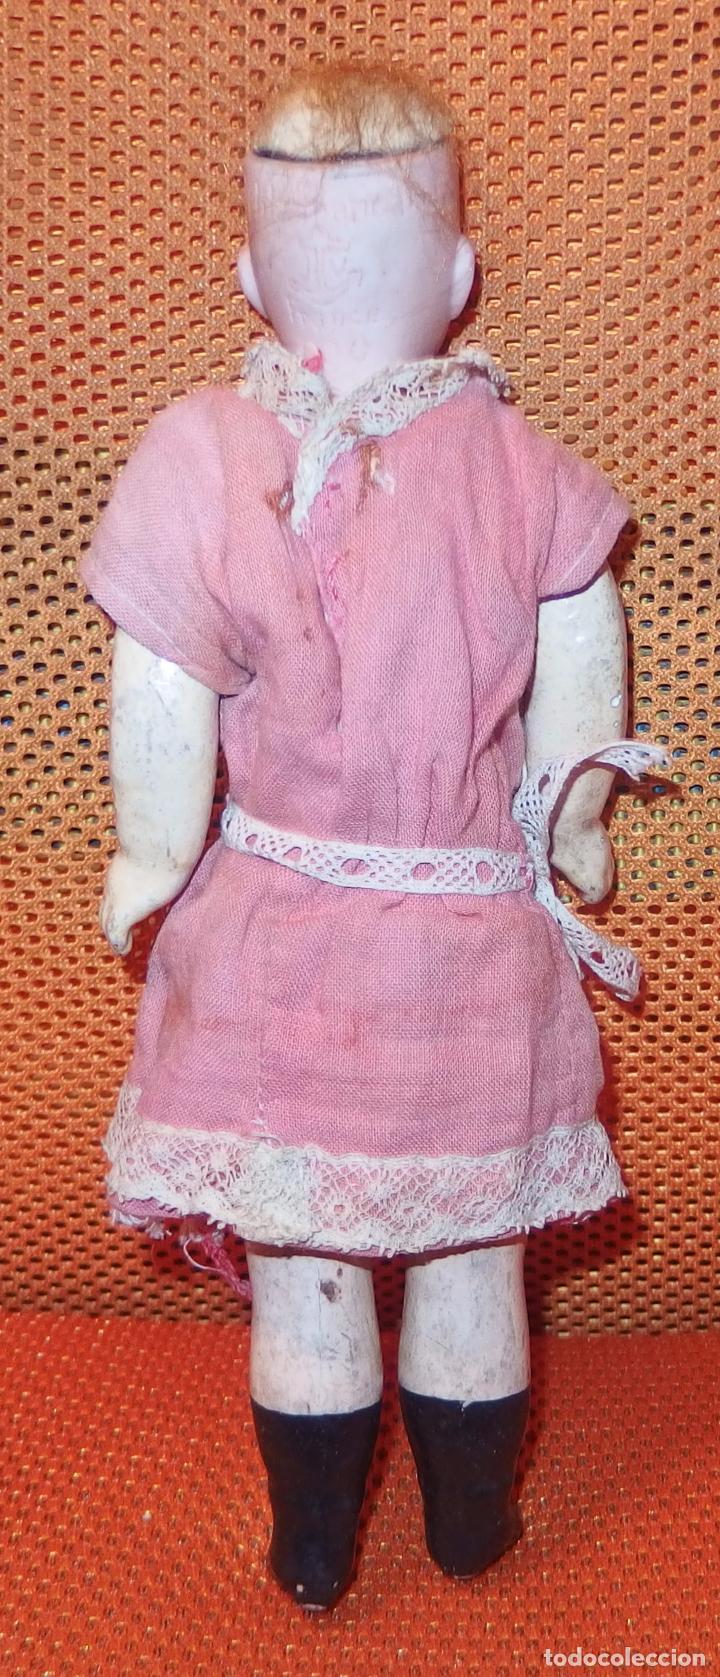 Muñecas Porcelana: MUÑECA PETITE FRANÇAISE,JULES VERLINGUE,FRANCE,PORCELANA,PPIO DEL SIGLO XX - Foto 3 - 76891363